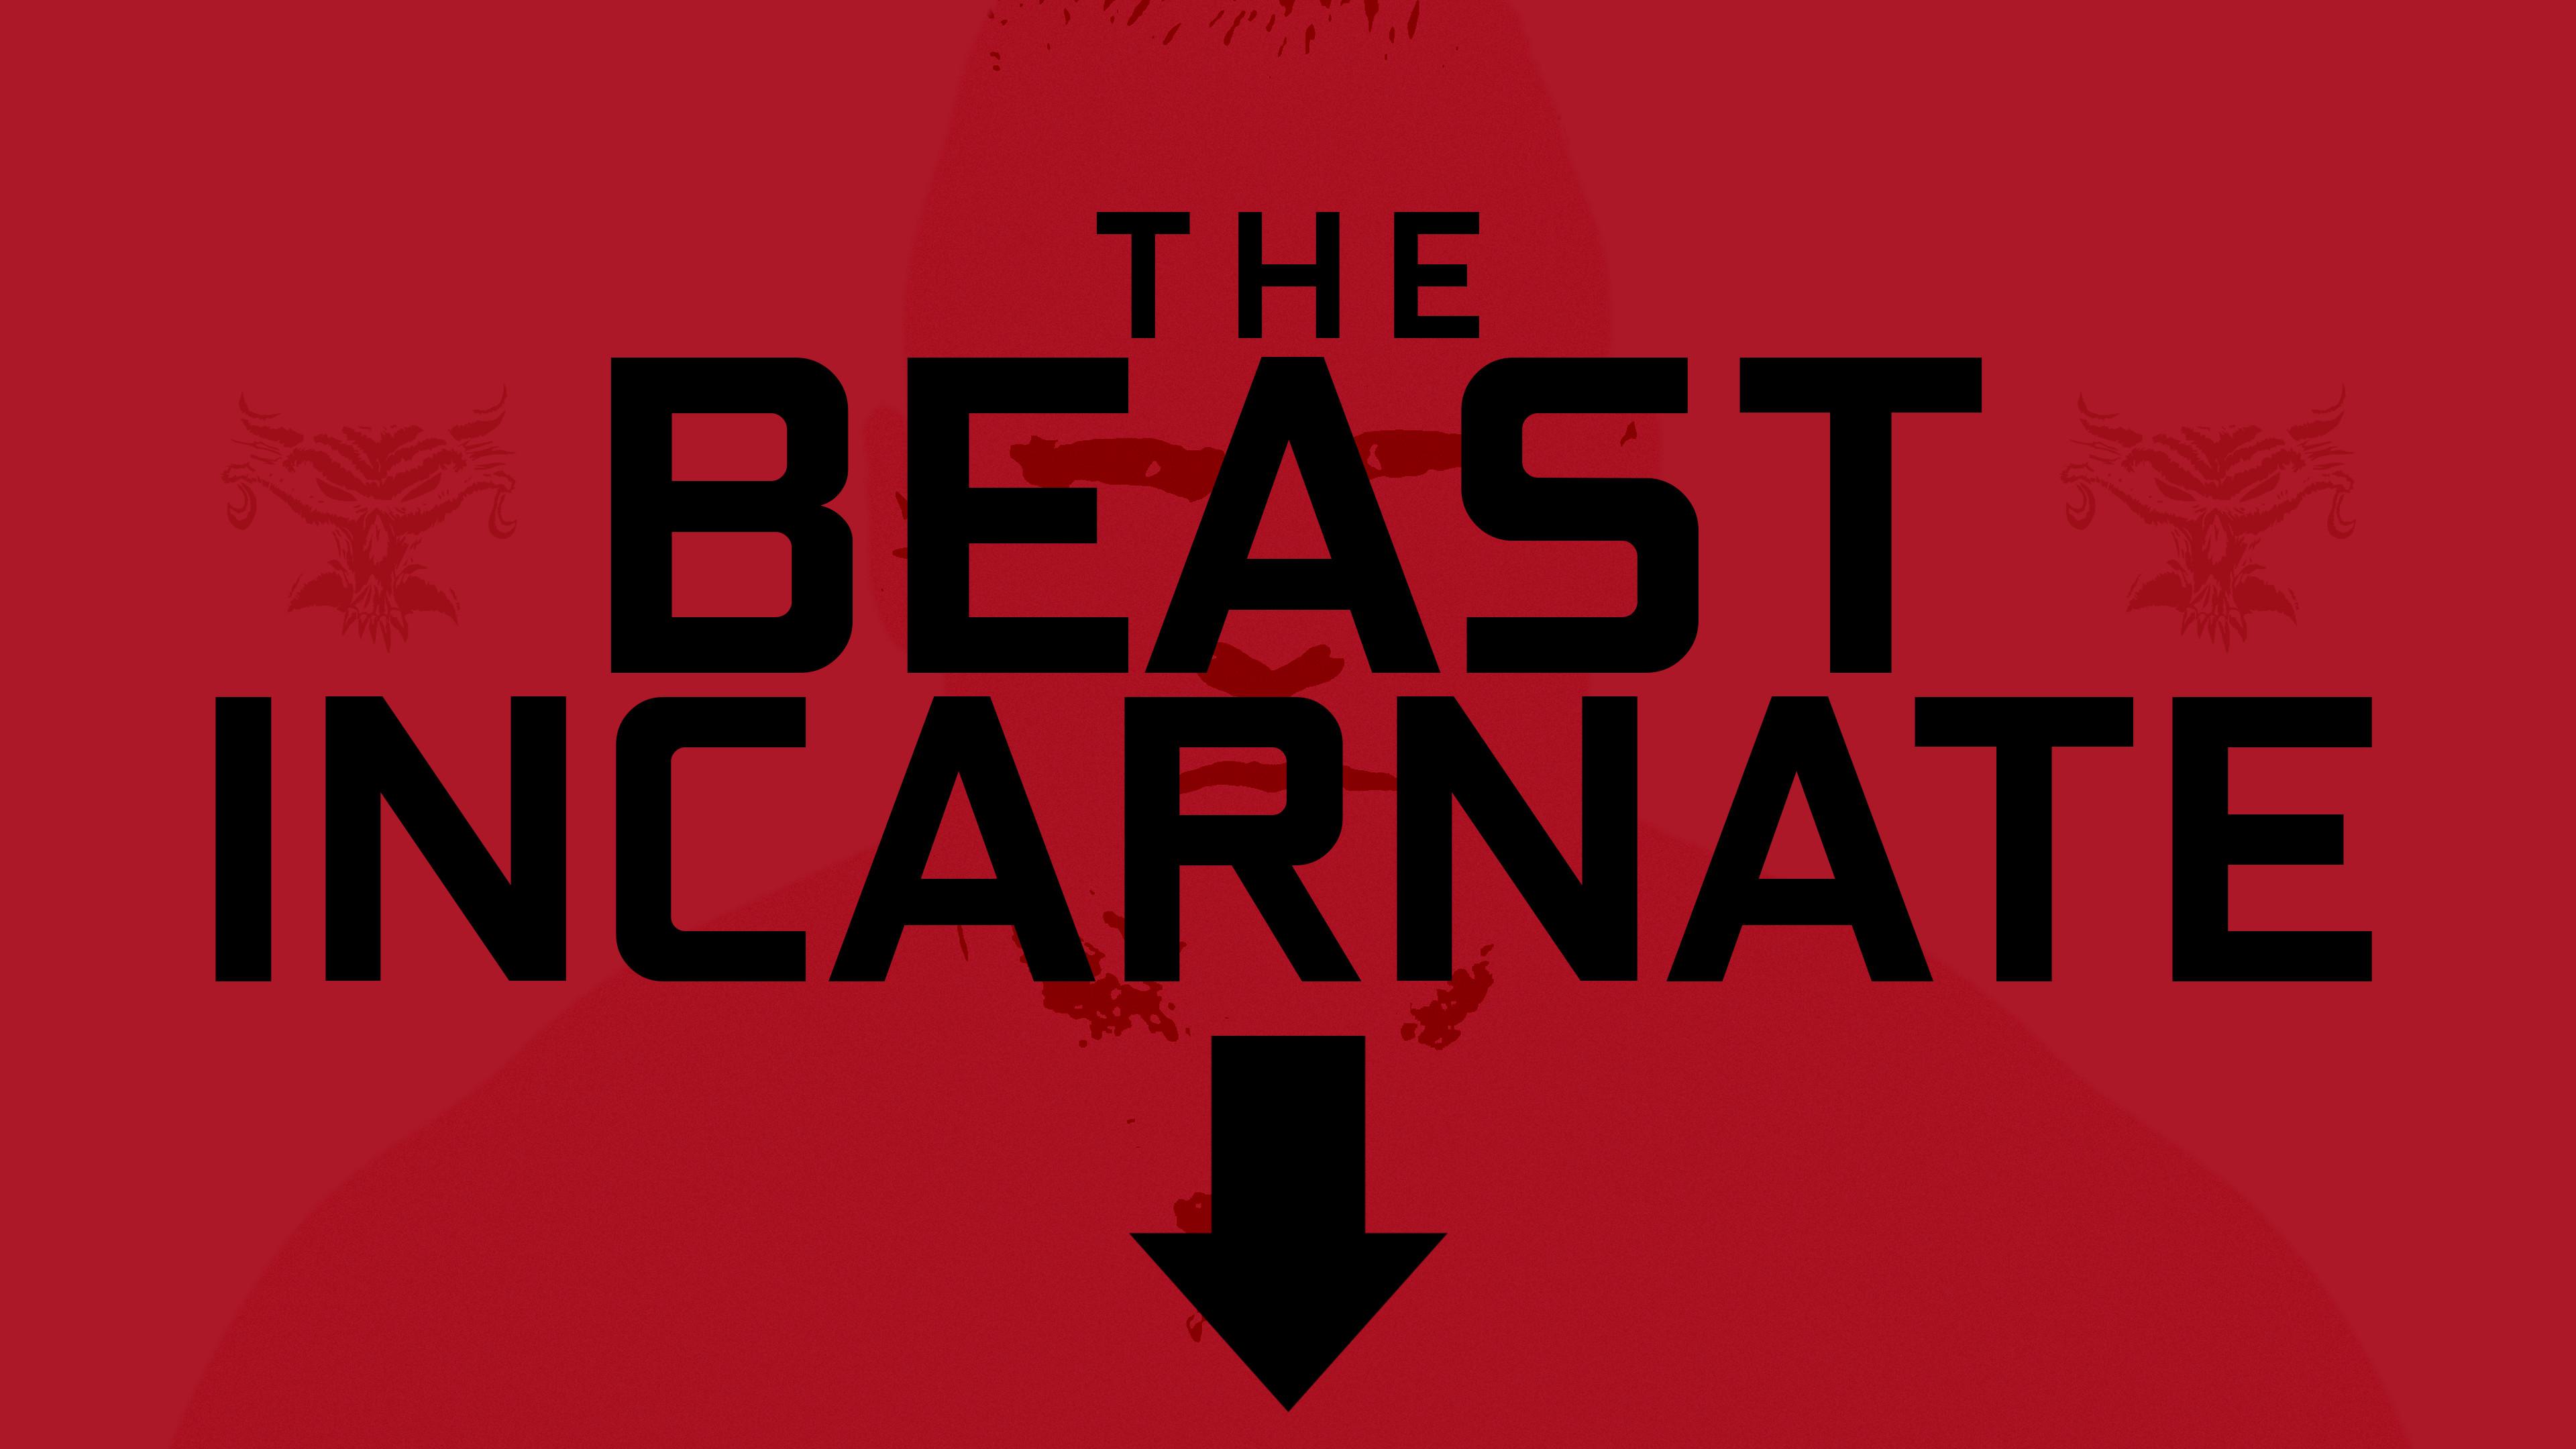 … The Beast Incarnate – BROCK LESNAR | Exclusive by CagatayDemir